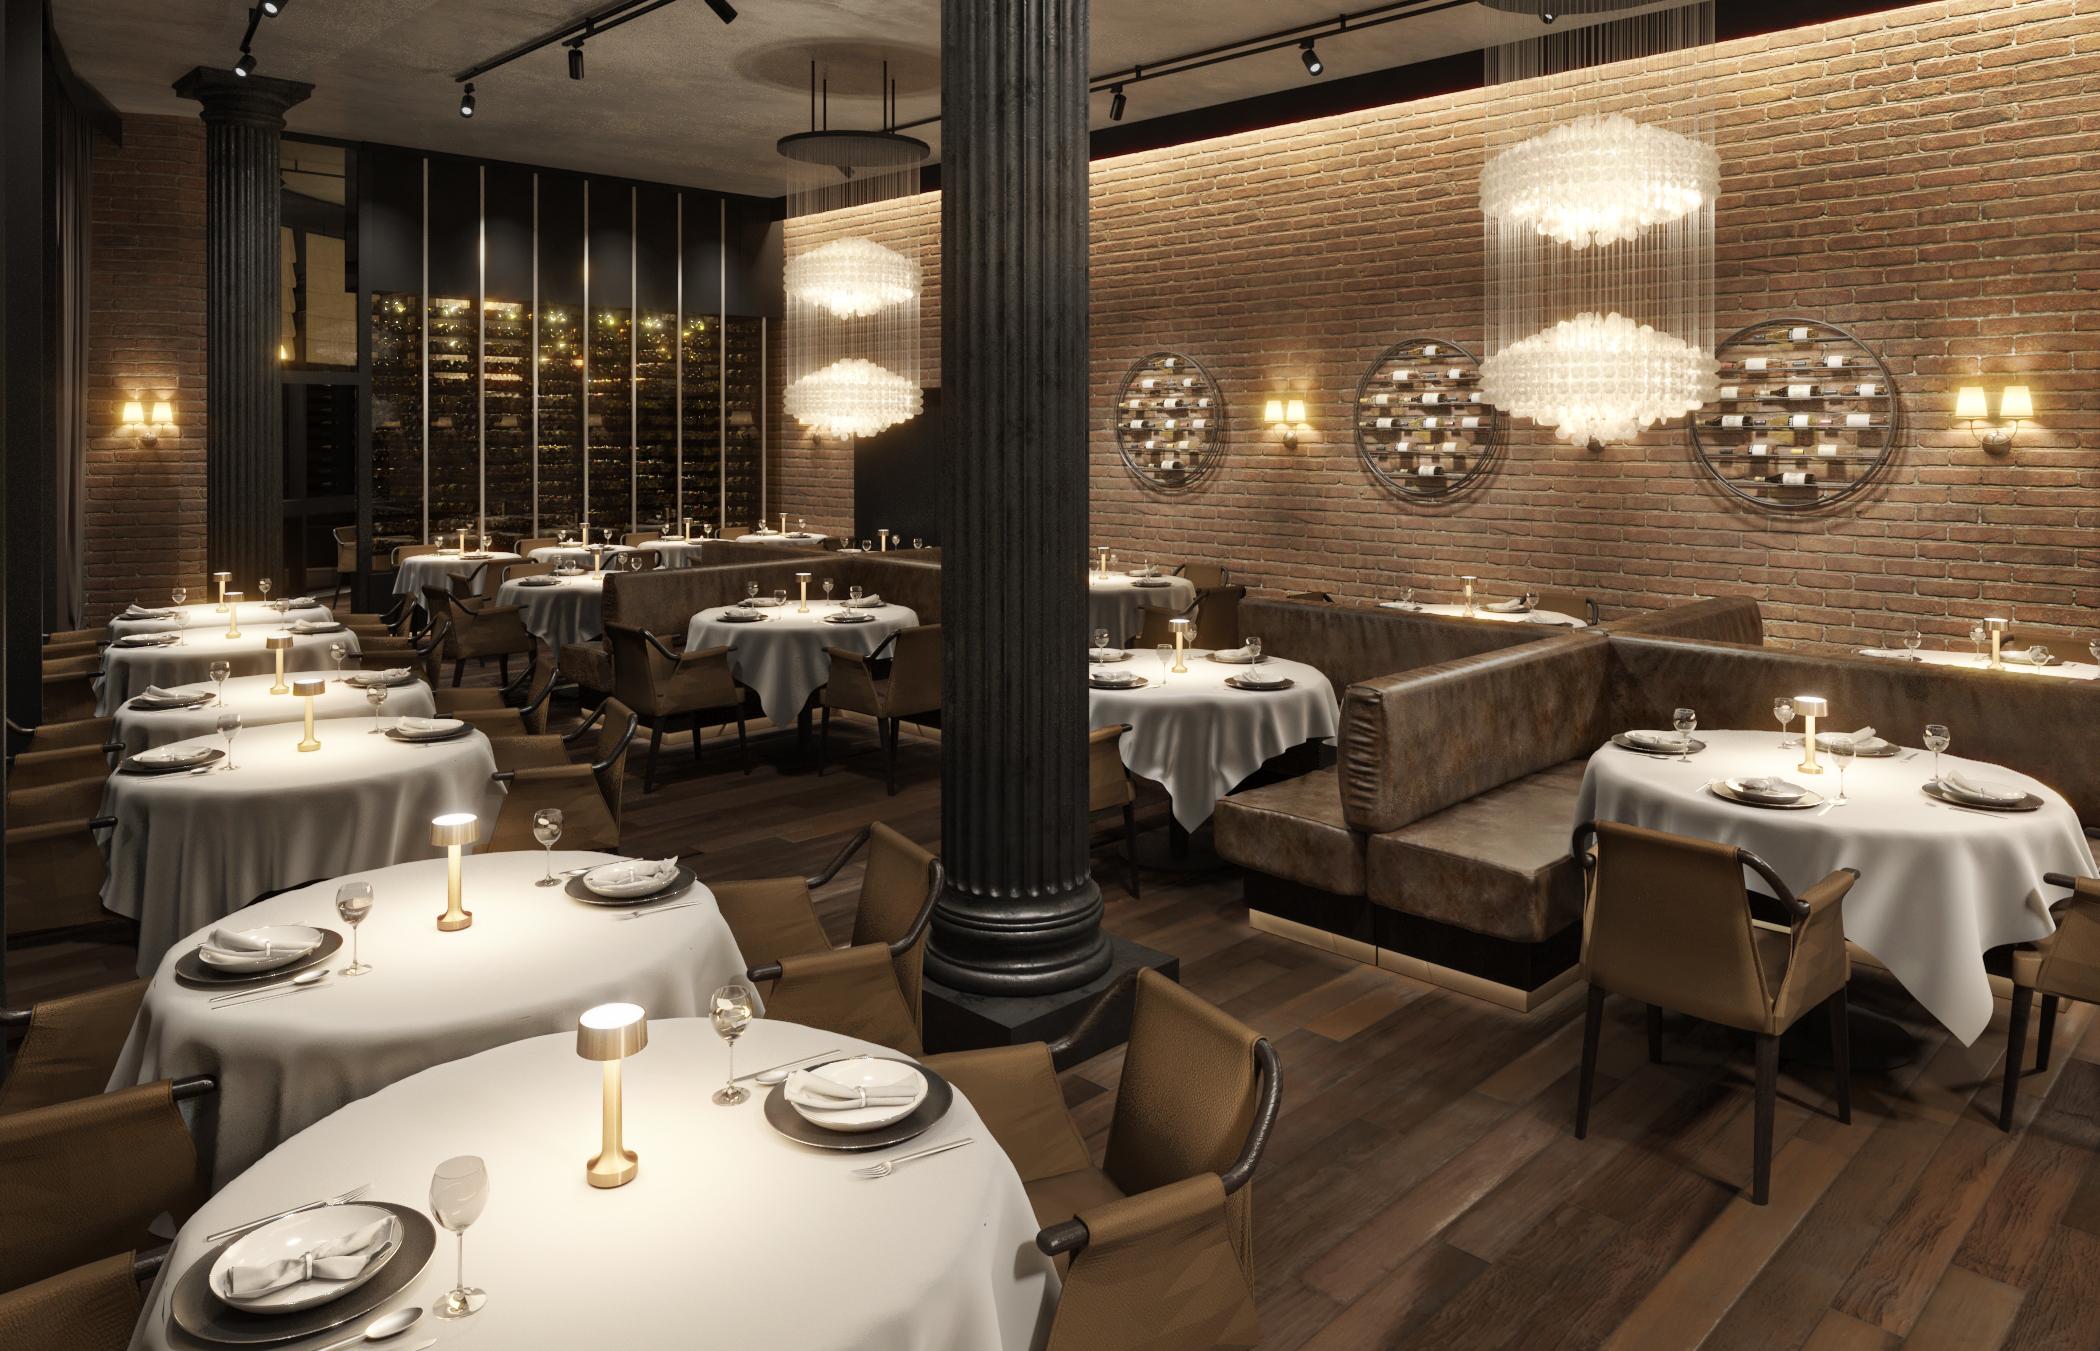 https://martinuzzi.ch/wp-content/uploads/2019/12/Doppio_gusto_restaurant_corner_entrance_1.jpg